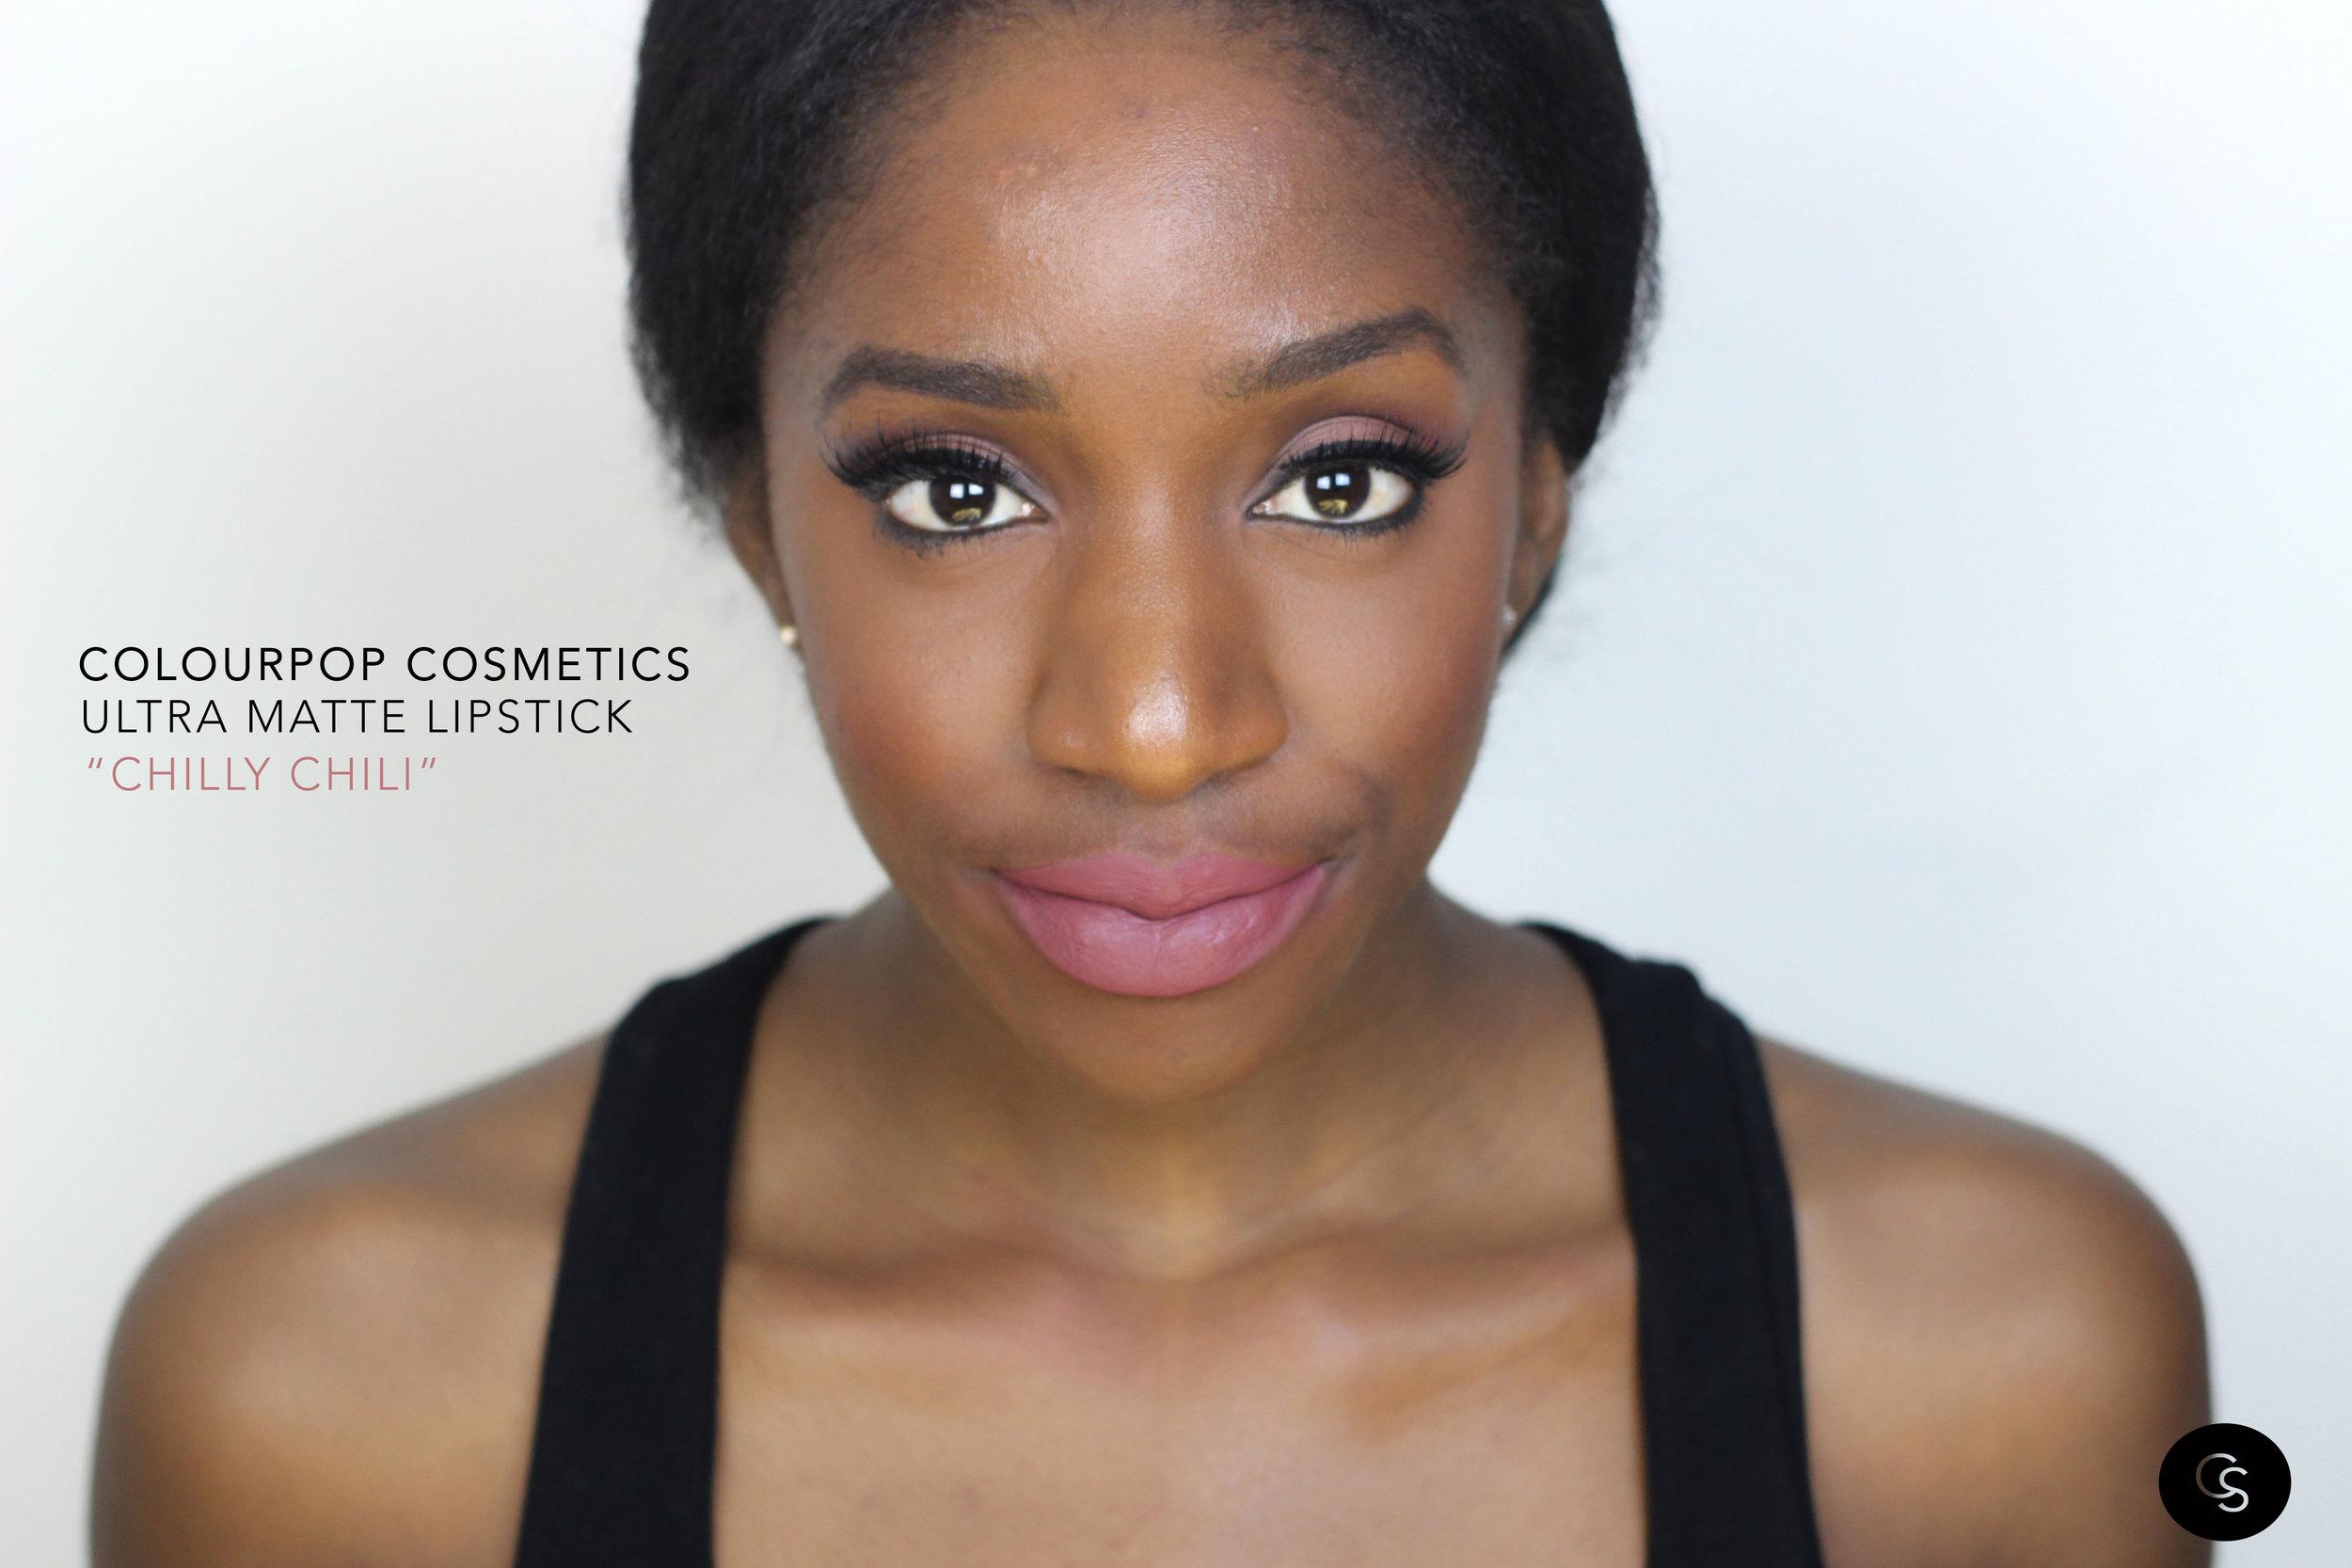 chilly chili colourpop cosmetics on dark skin